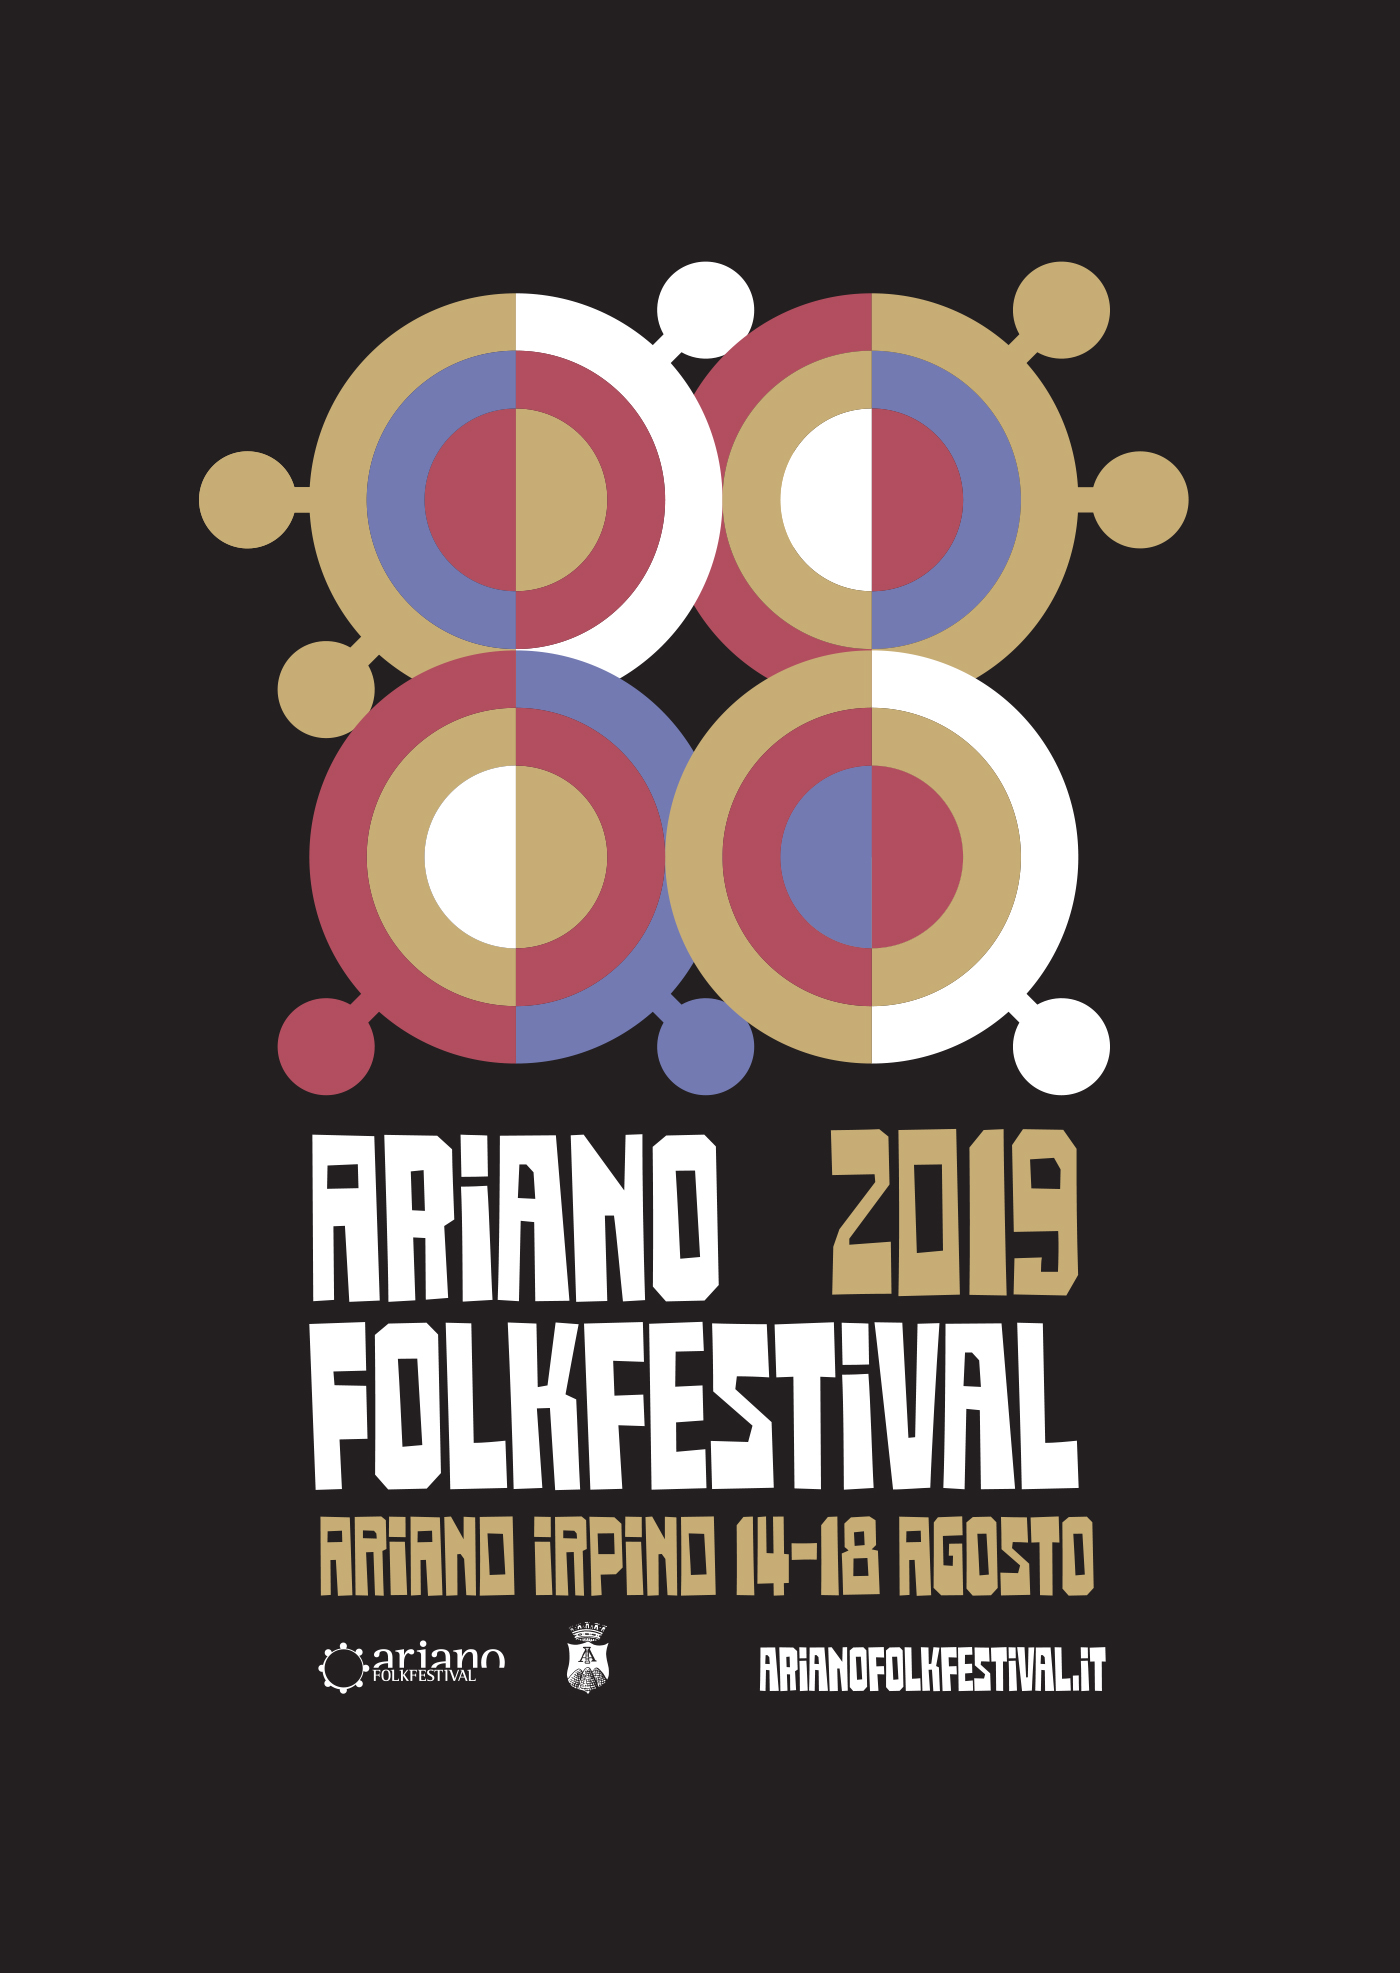 Ariano Folkfestival 2019 – Carnival Edition